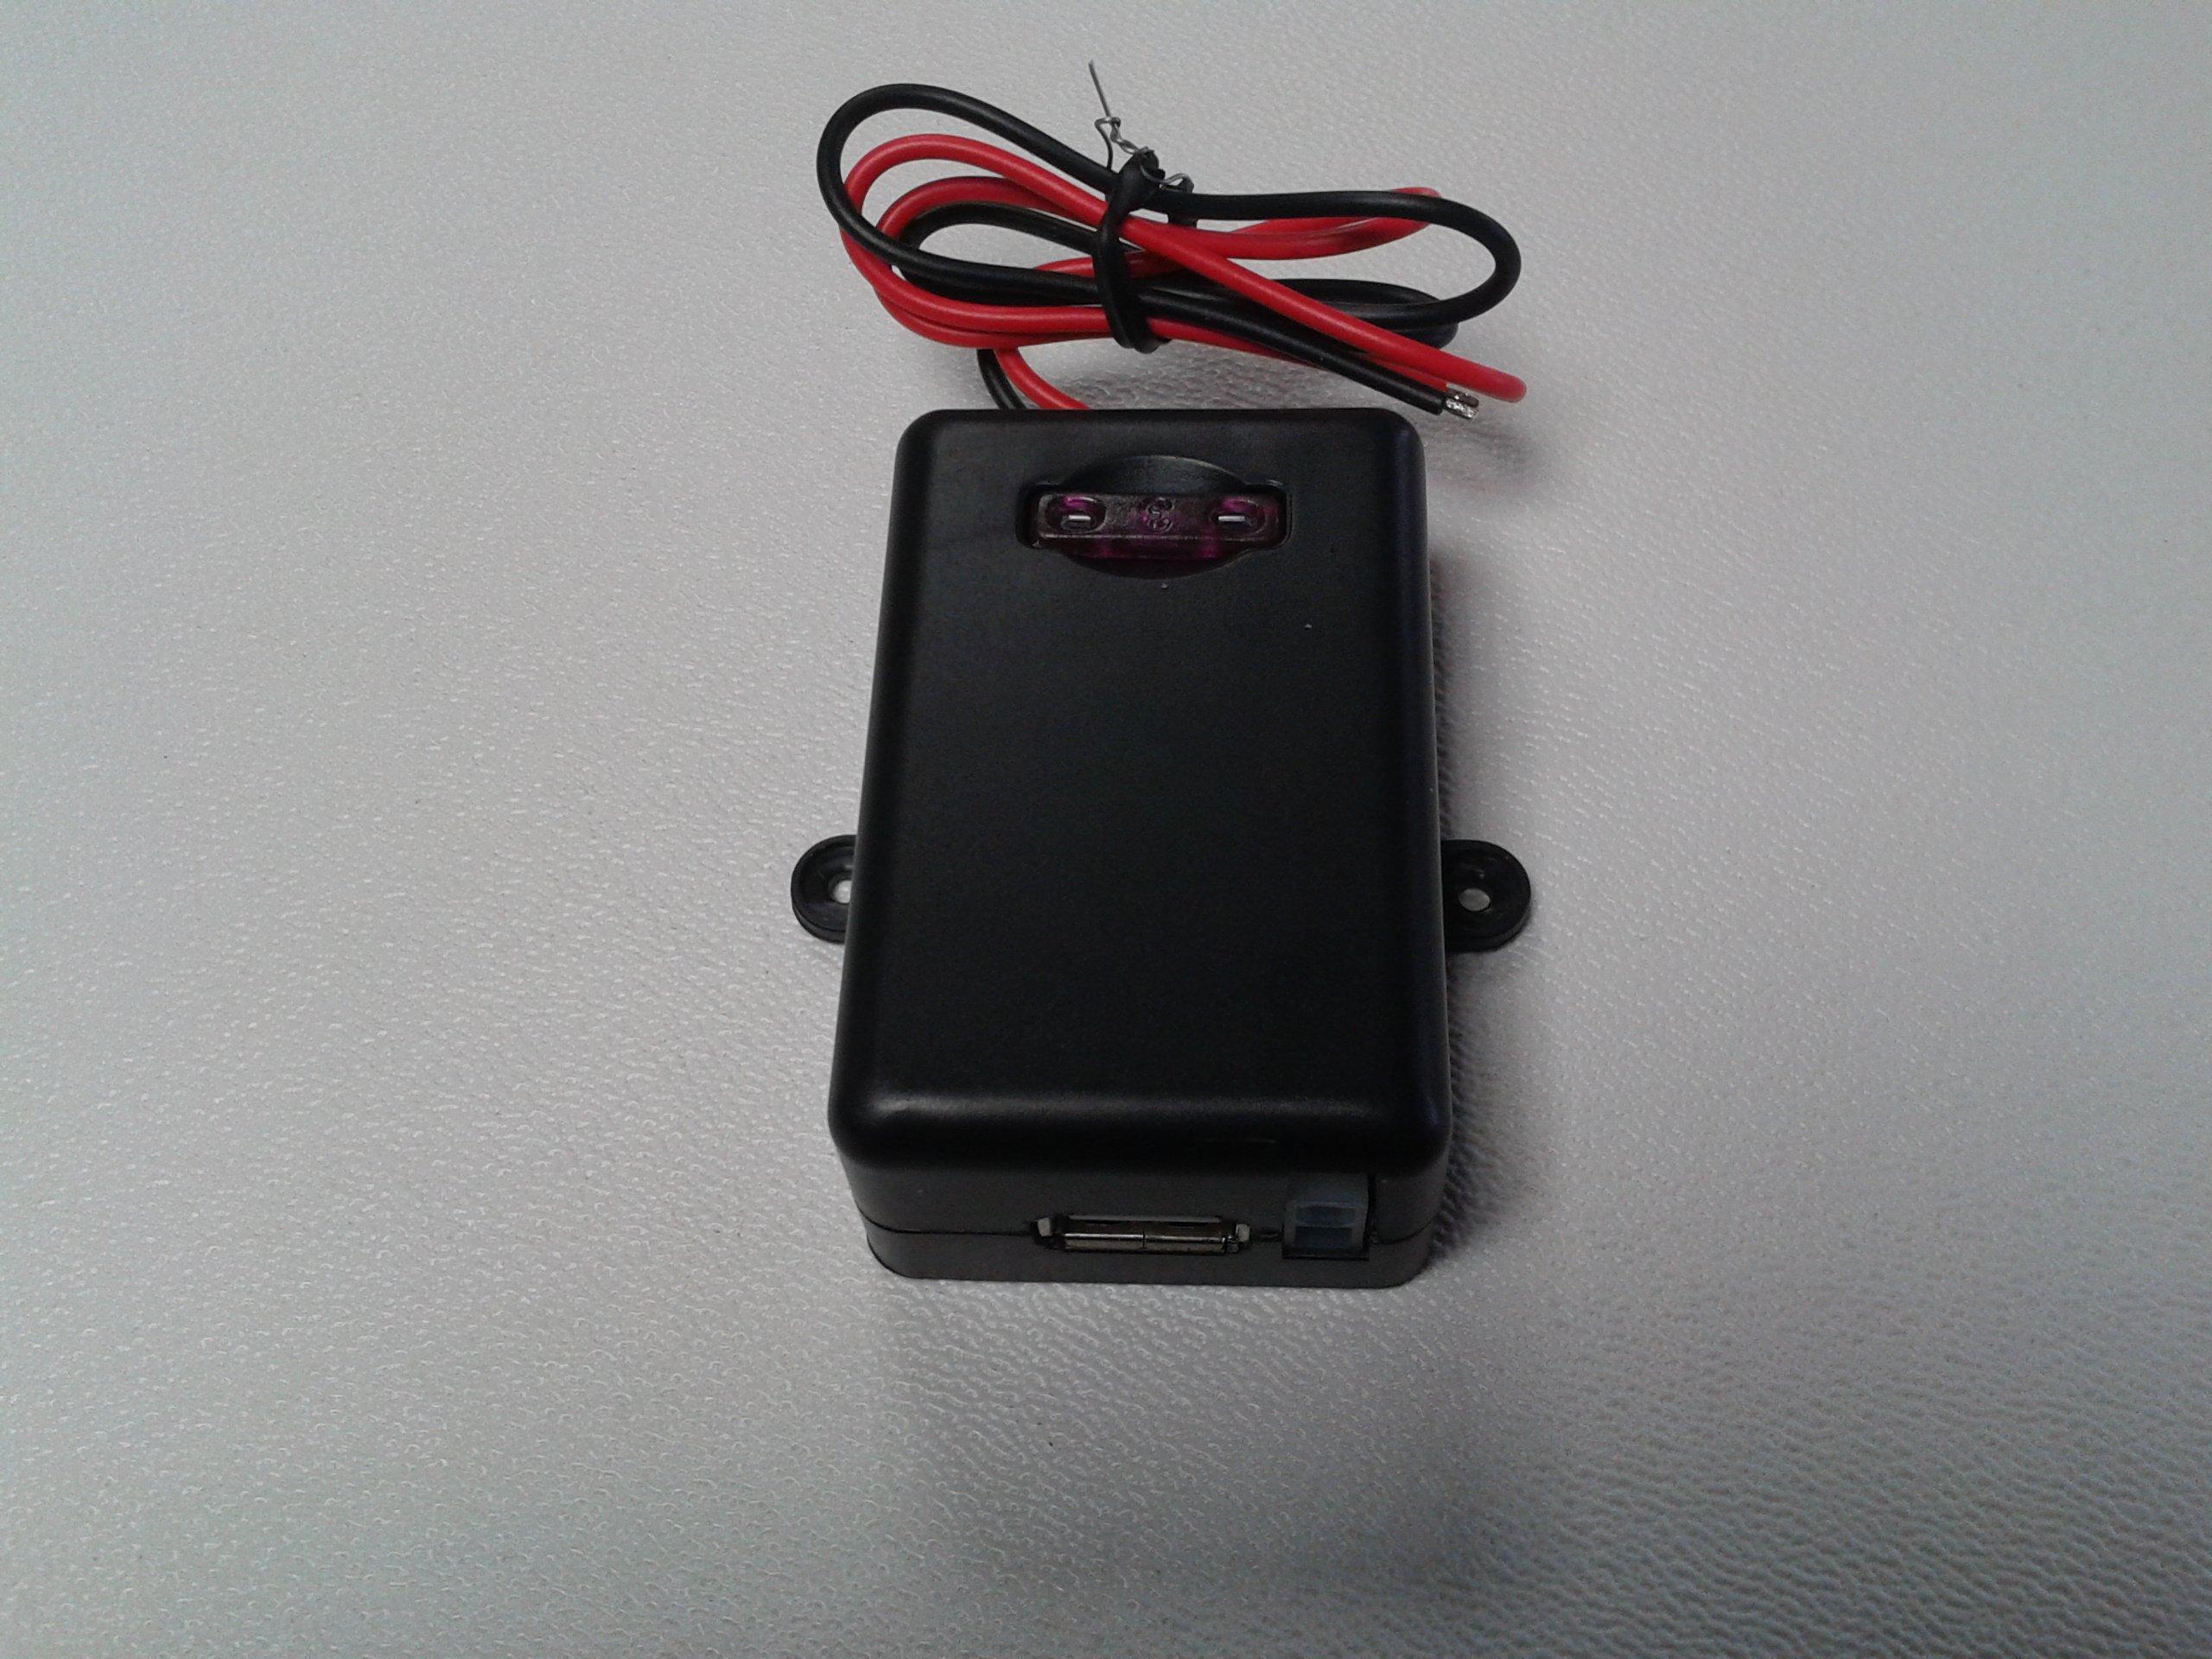 Adattatore USB 5V per roulotte camper barca camion ingresso 6V 12V 14V nuovo